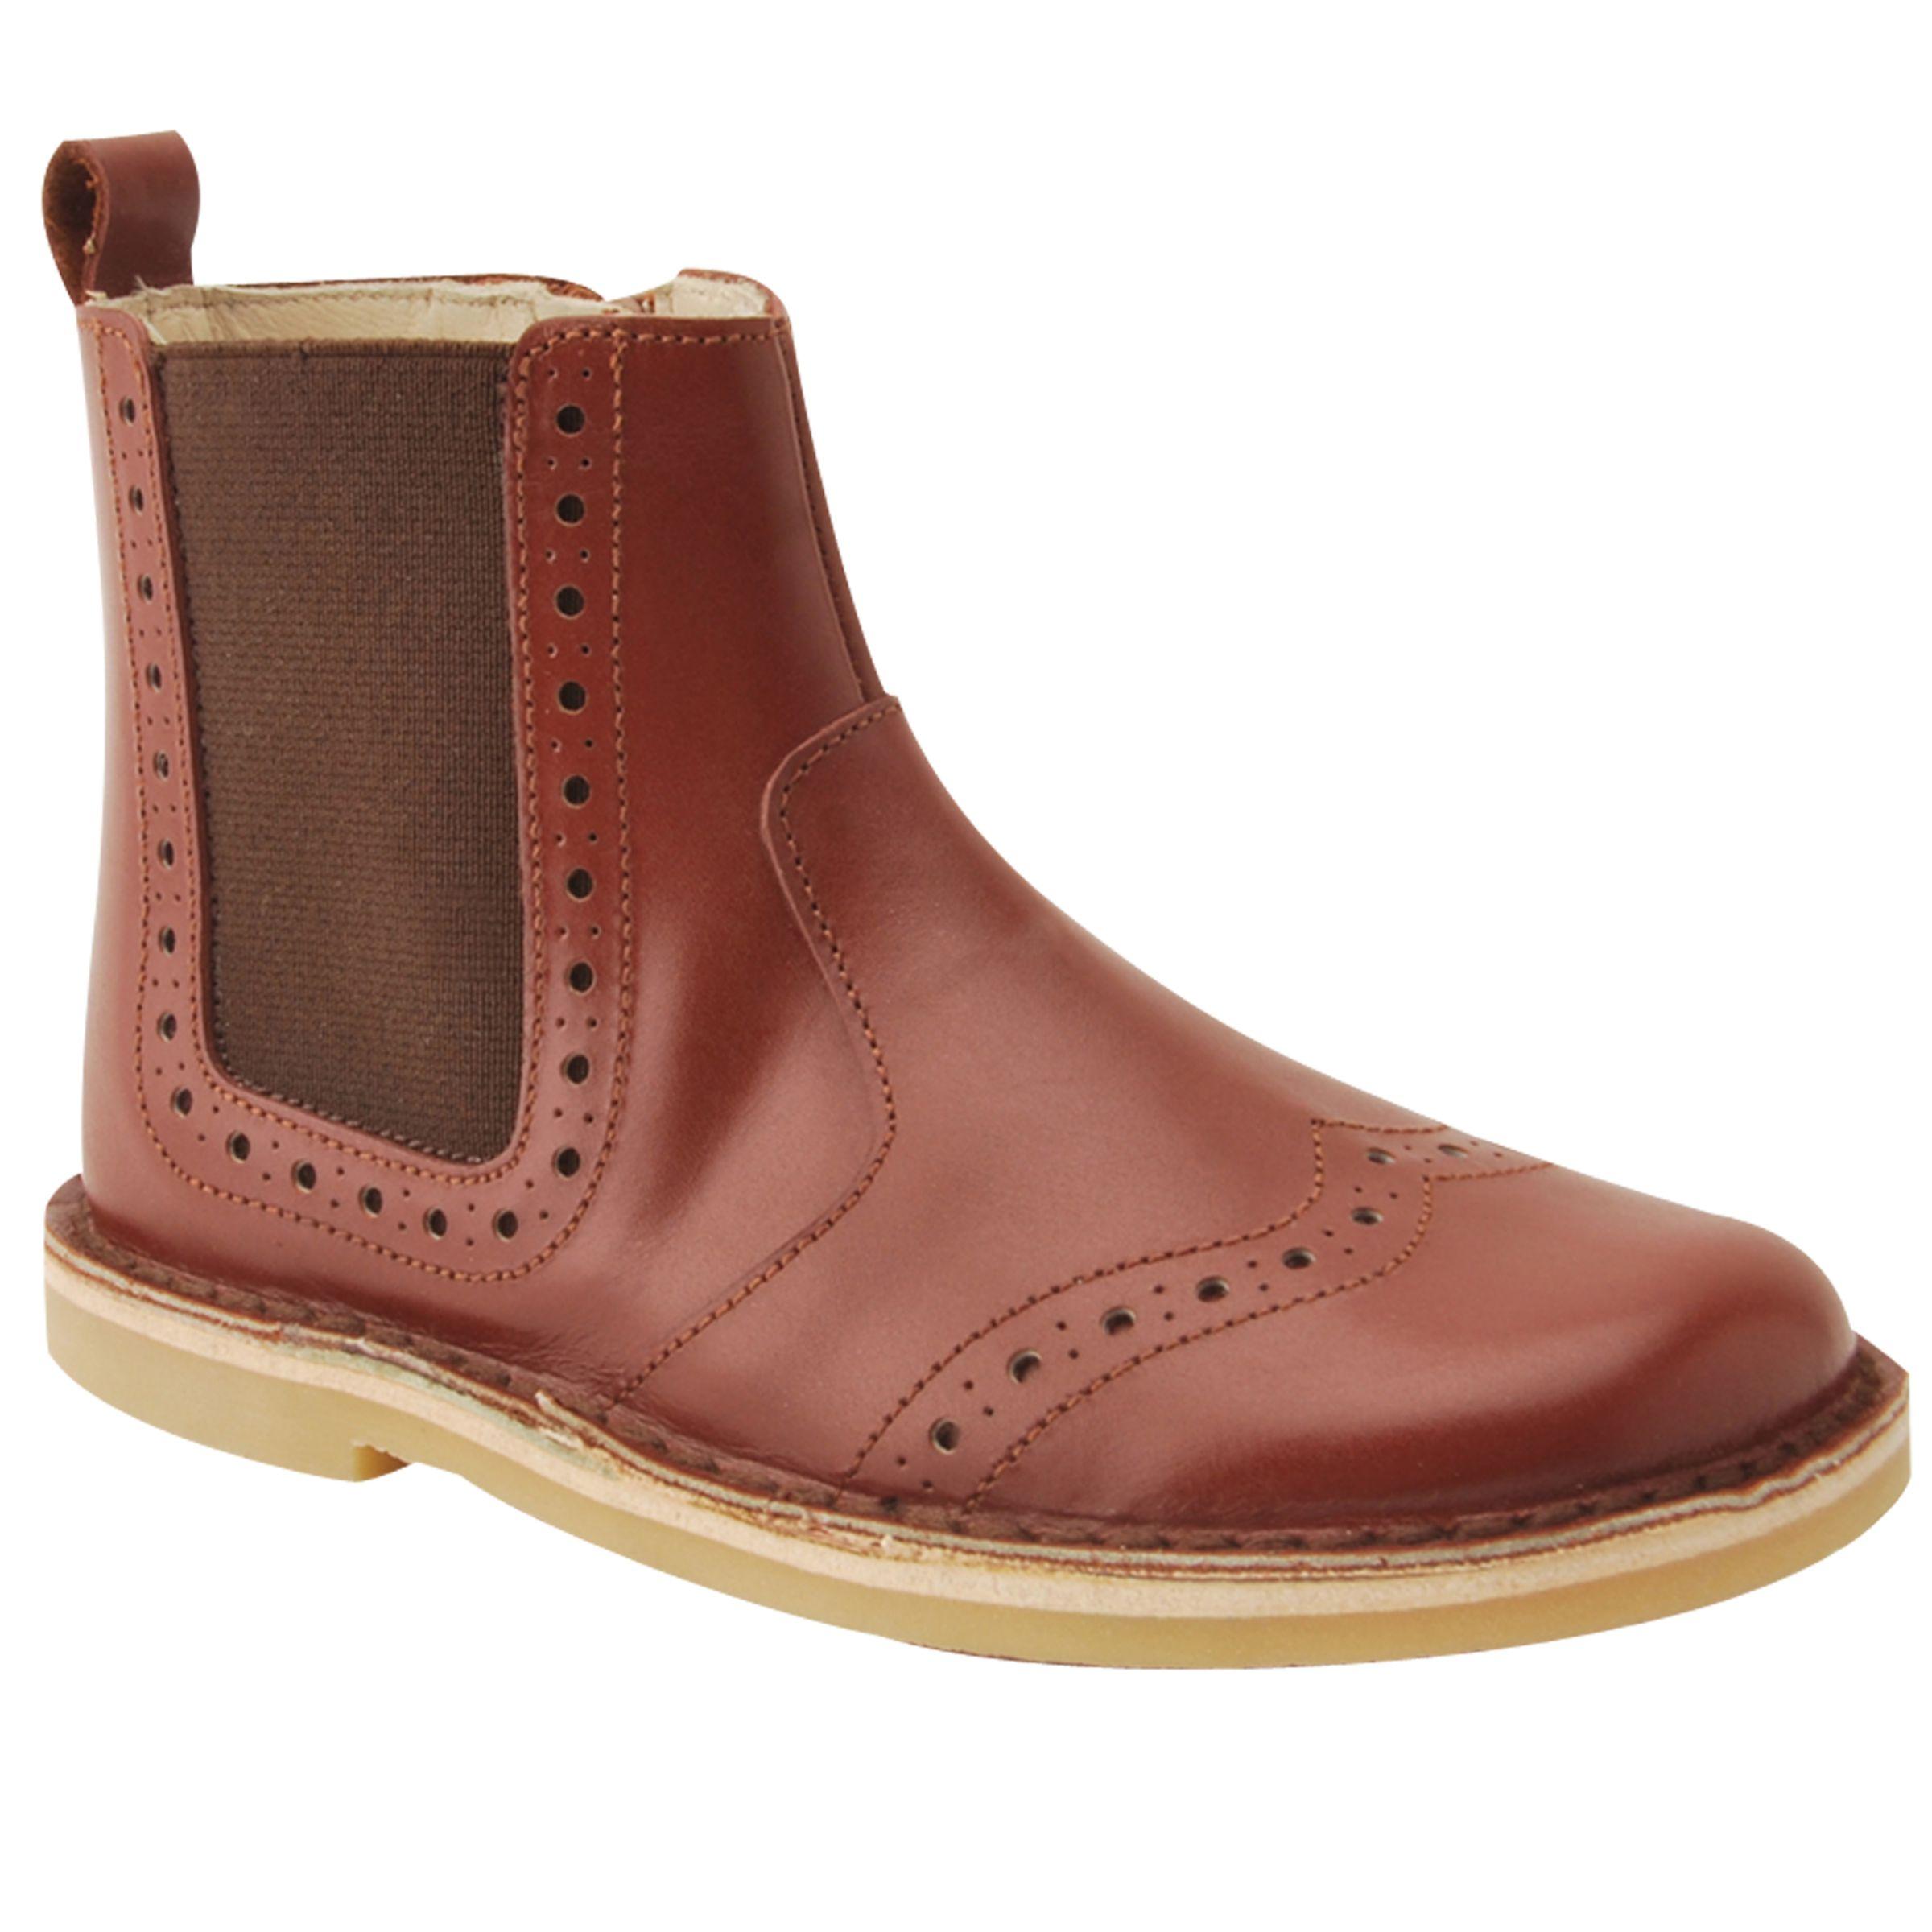 Start-Rite Start-rite Children's Bugsy Leather Boots, Tan